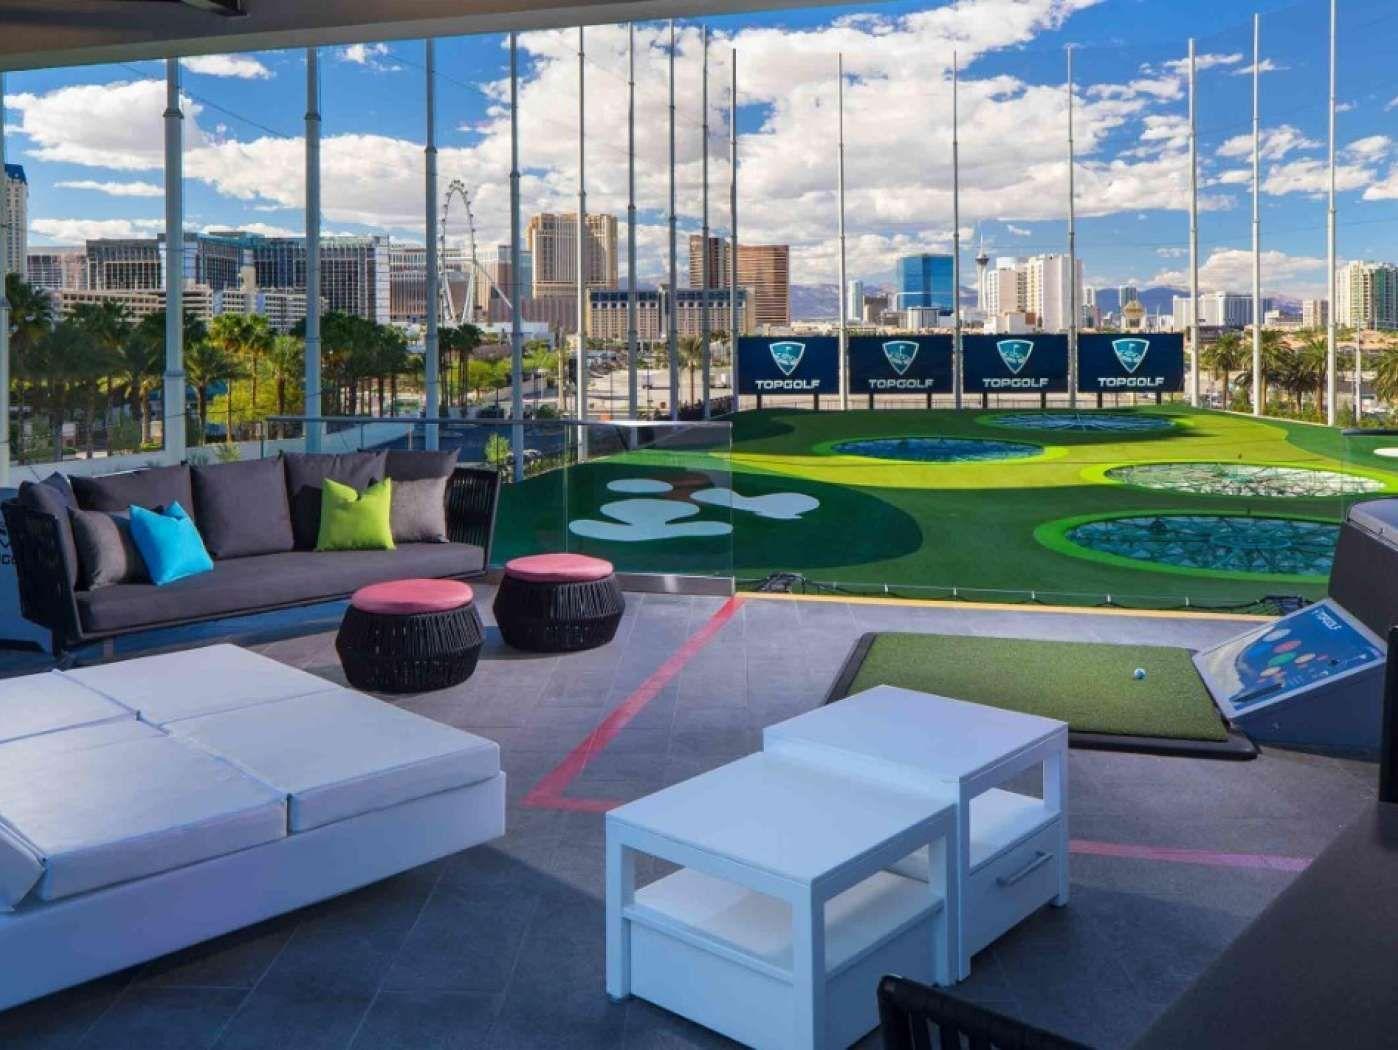 top golf mgm grand